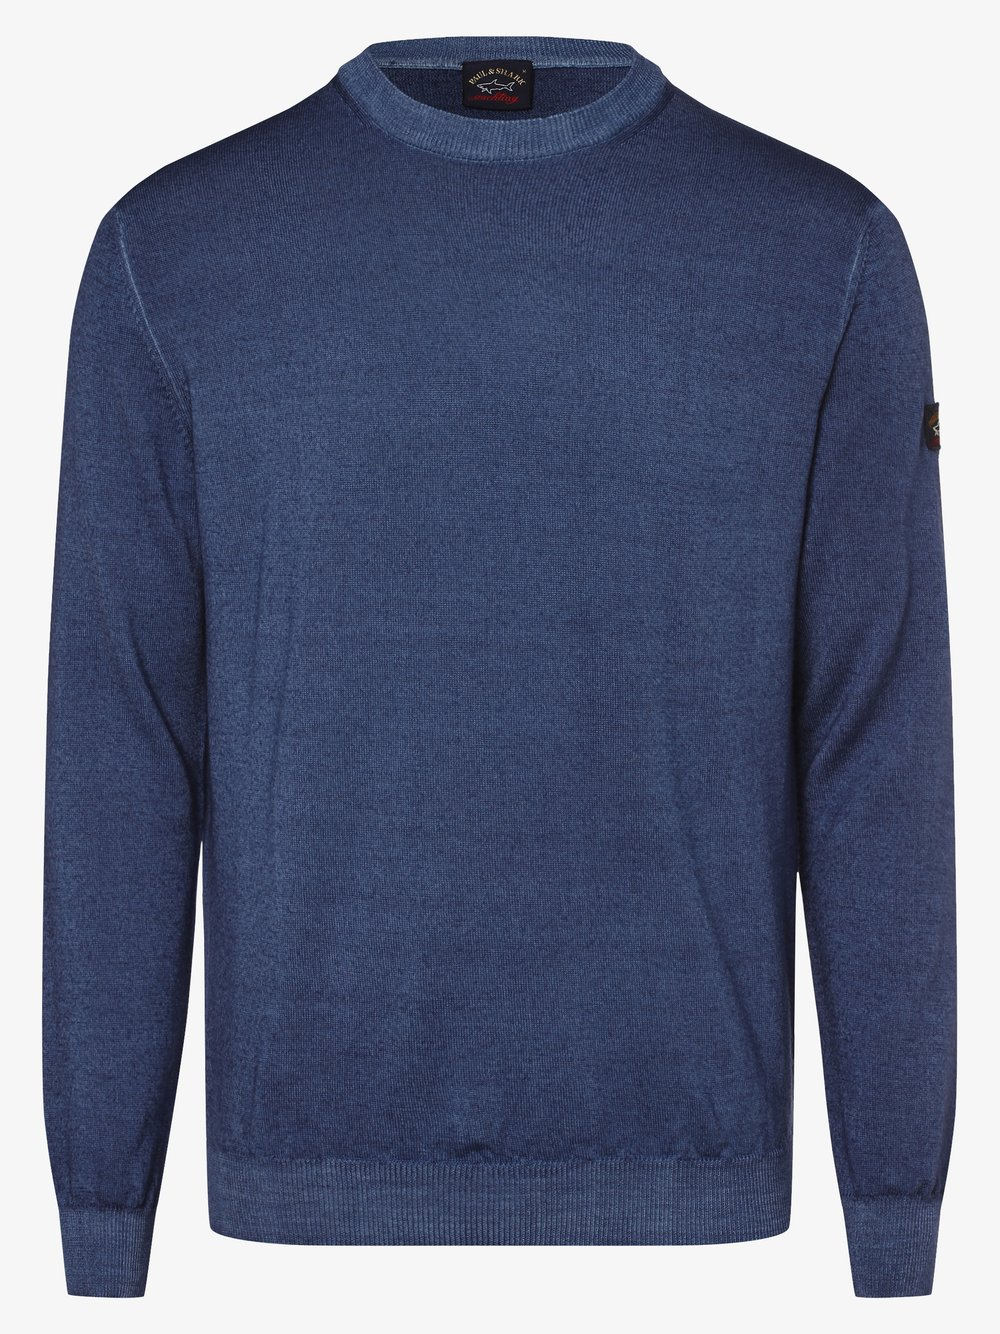 Paul & Shark - Sweter męski, niebieski